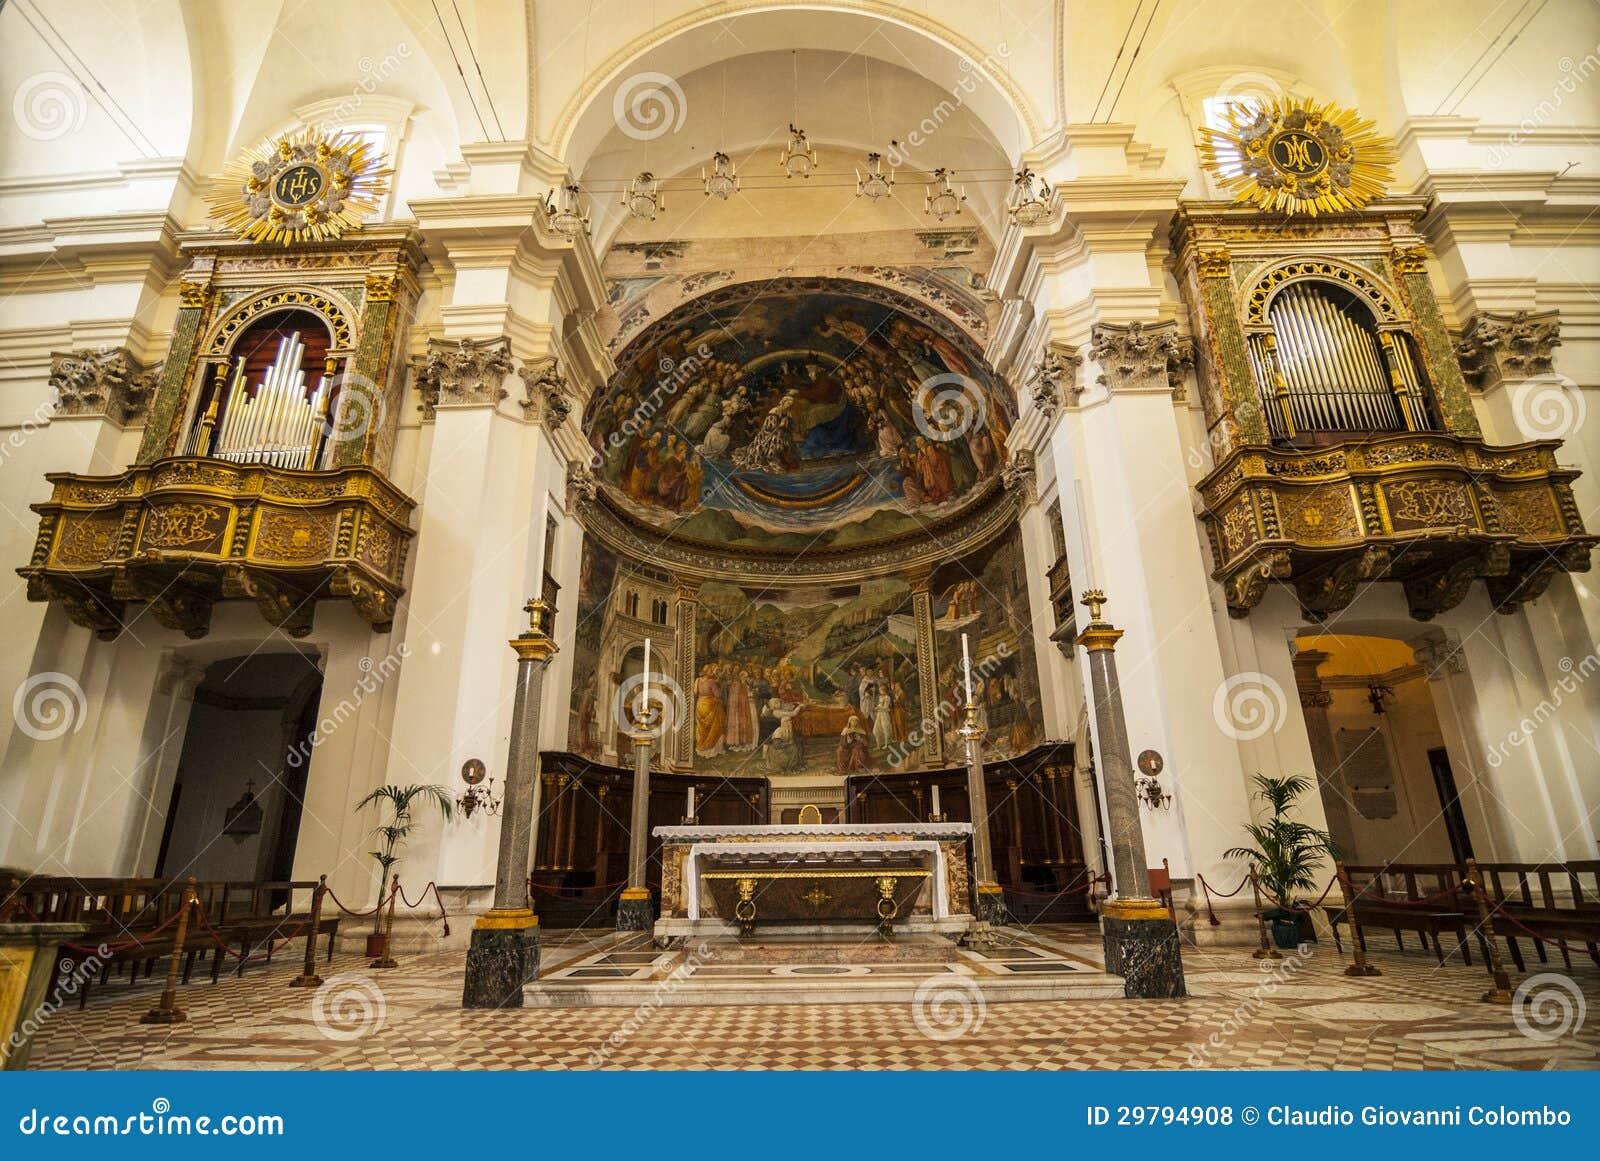 Spoleto interior da catedral fotos de stock royalty free - Interior design perugia ...